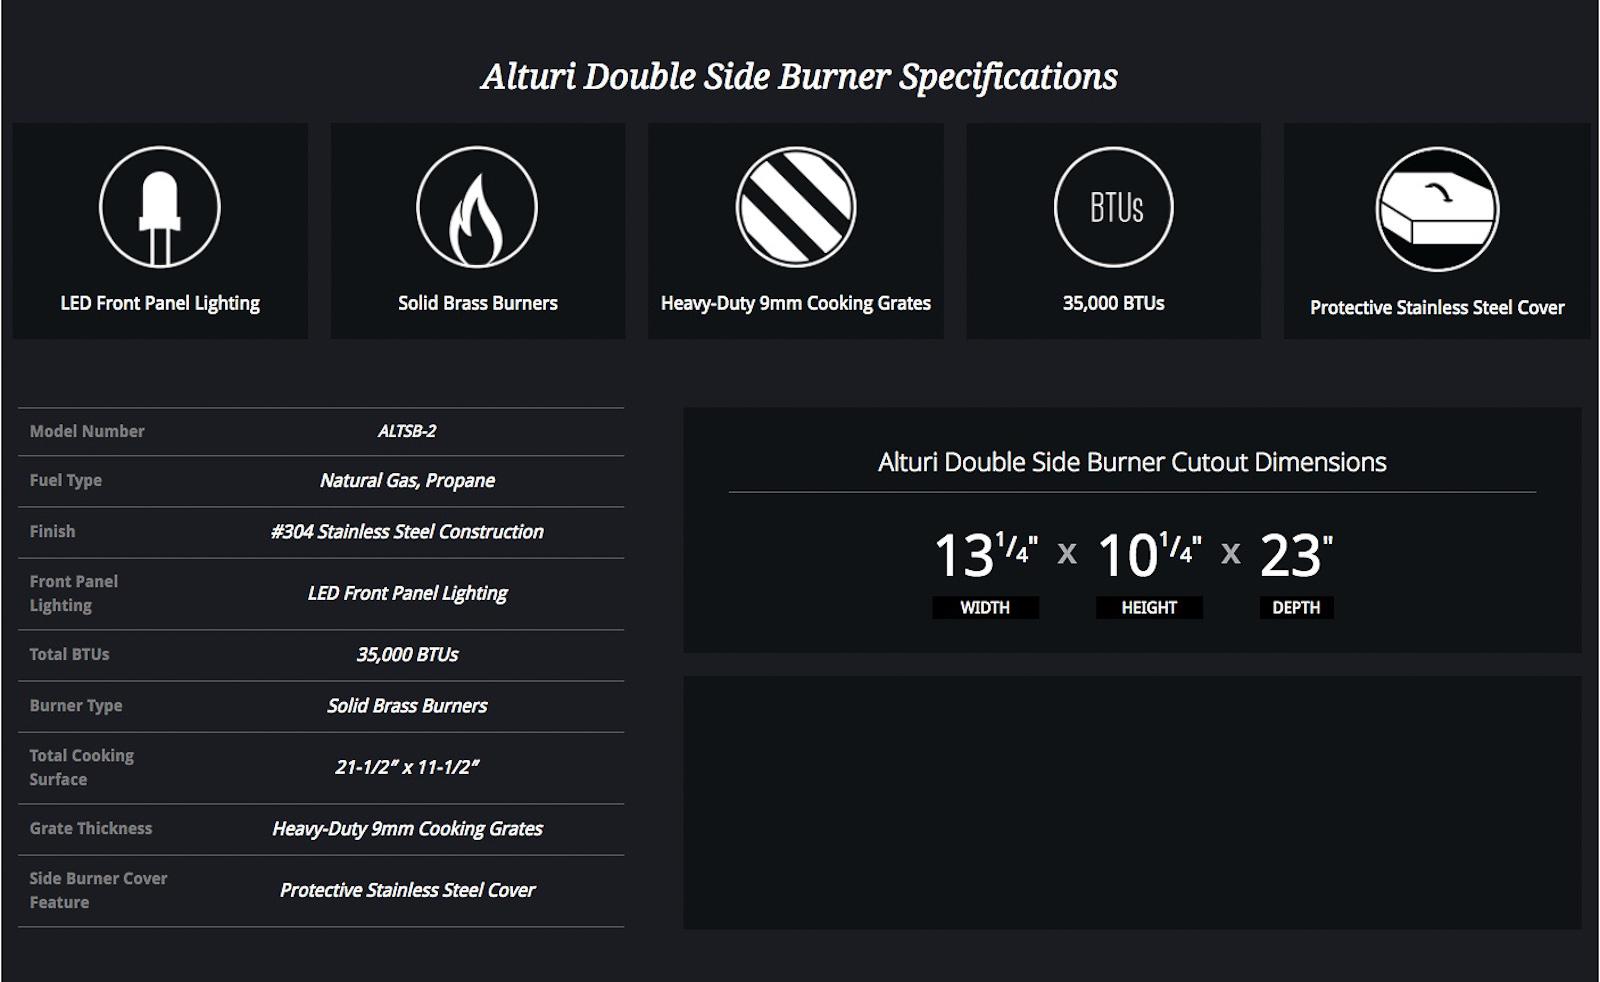 summerset-alturi-double-side-burner-alt-2b.jpg